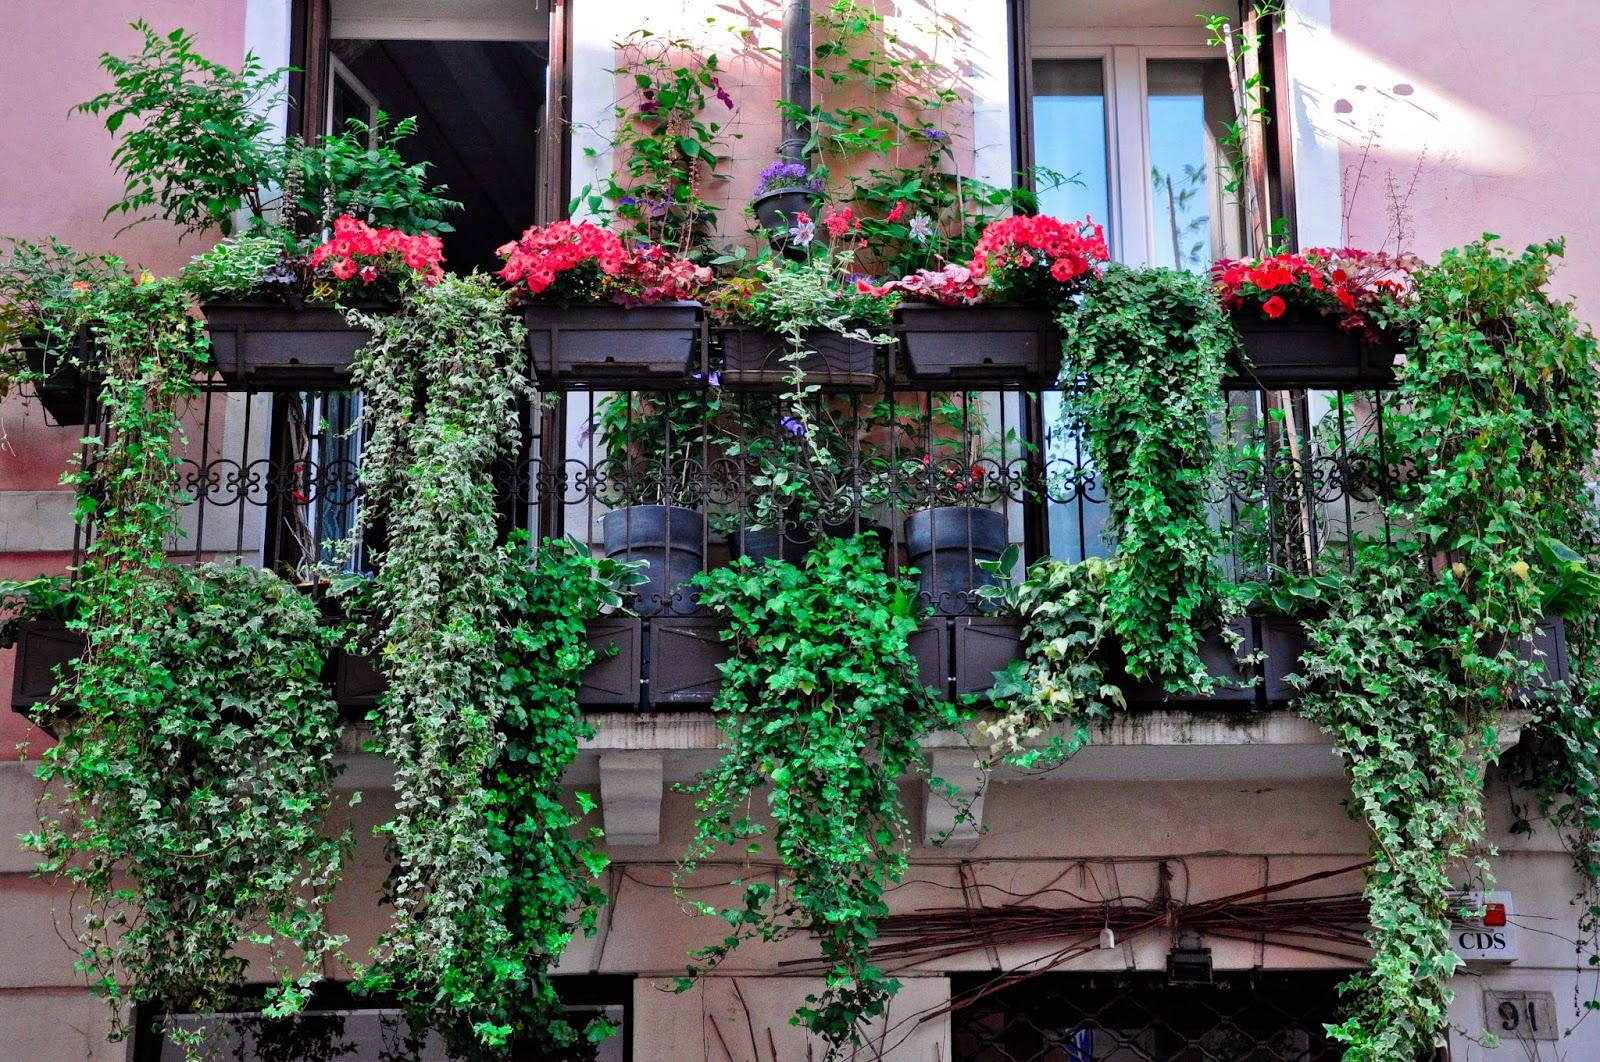 Image gallery italian balcony gardens for Balcony synonym